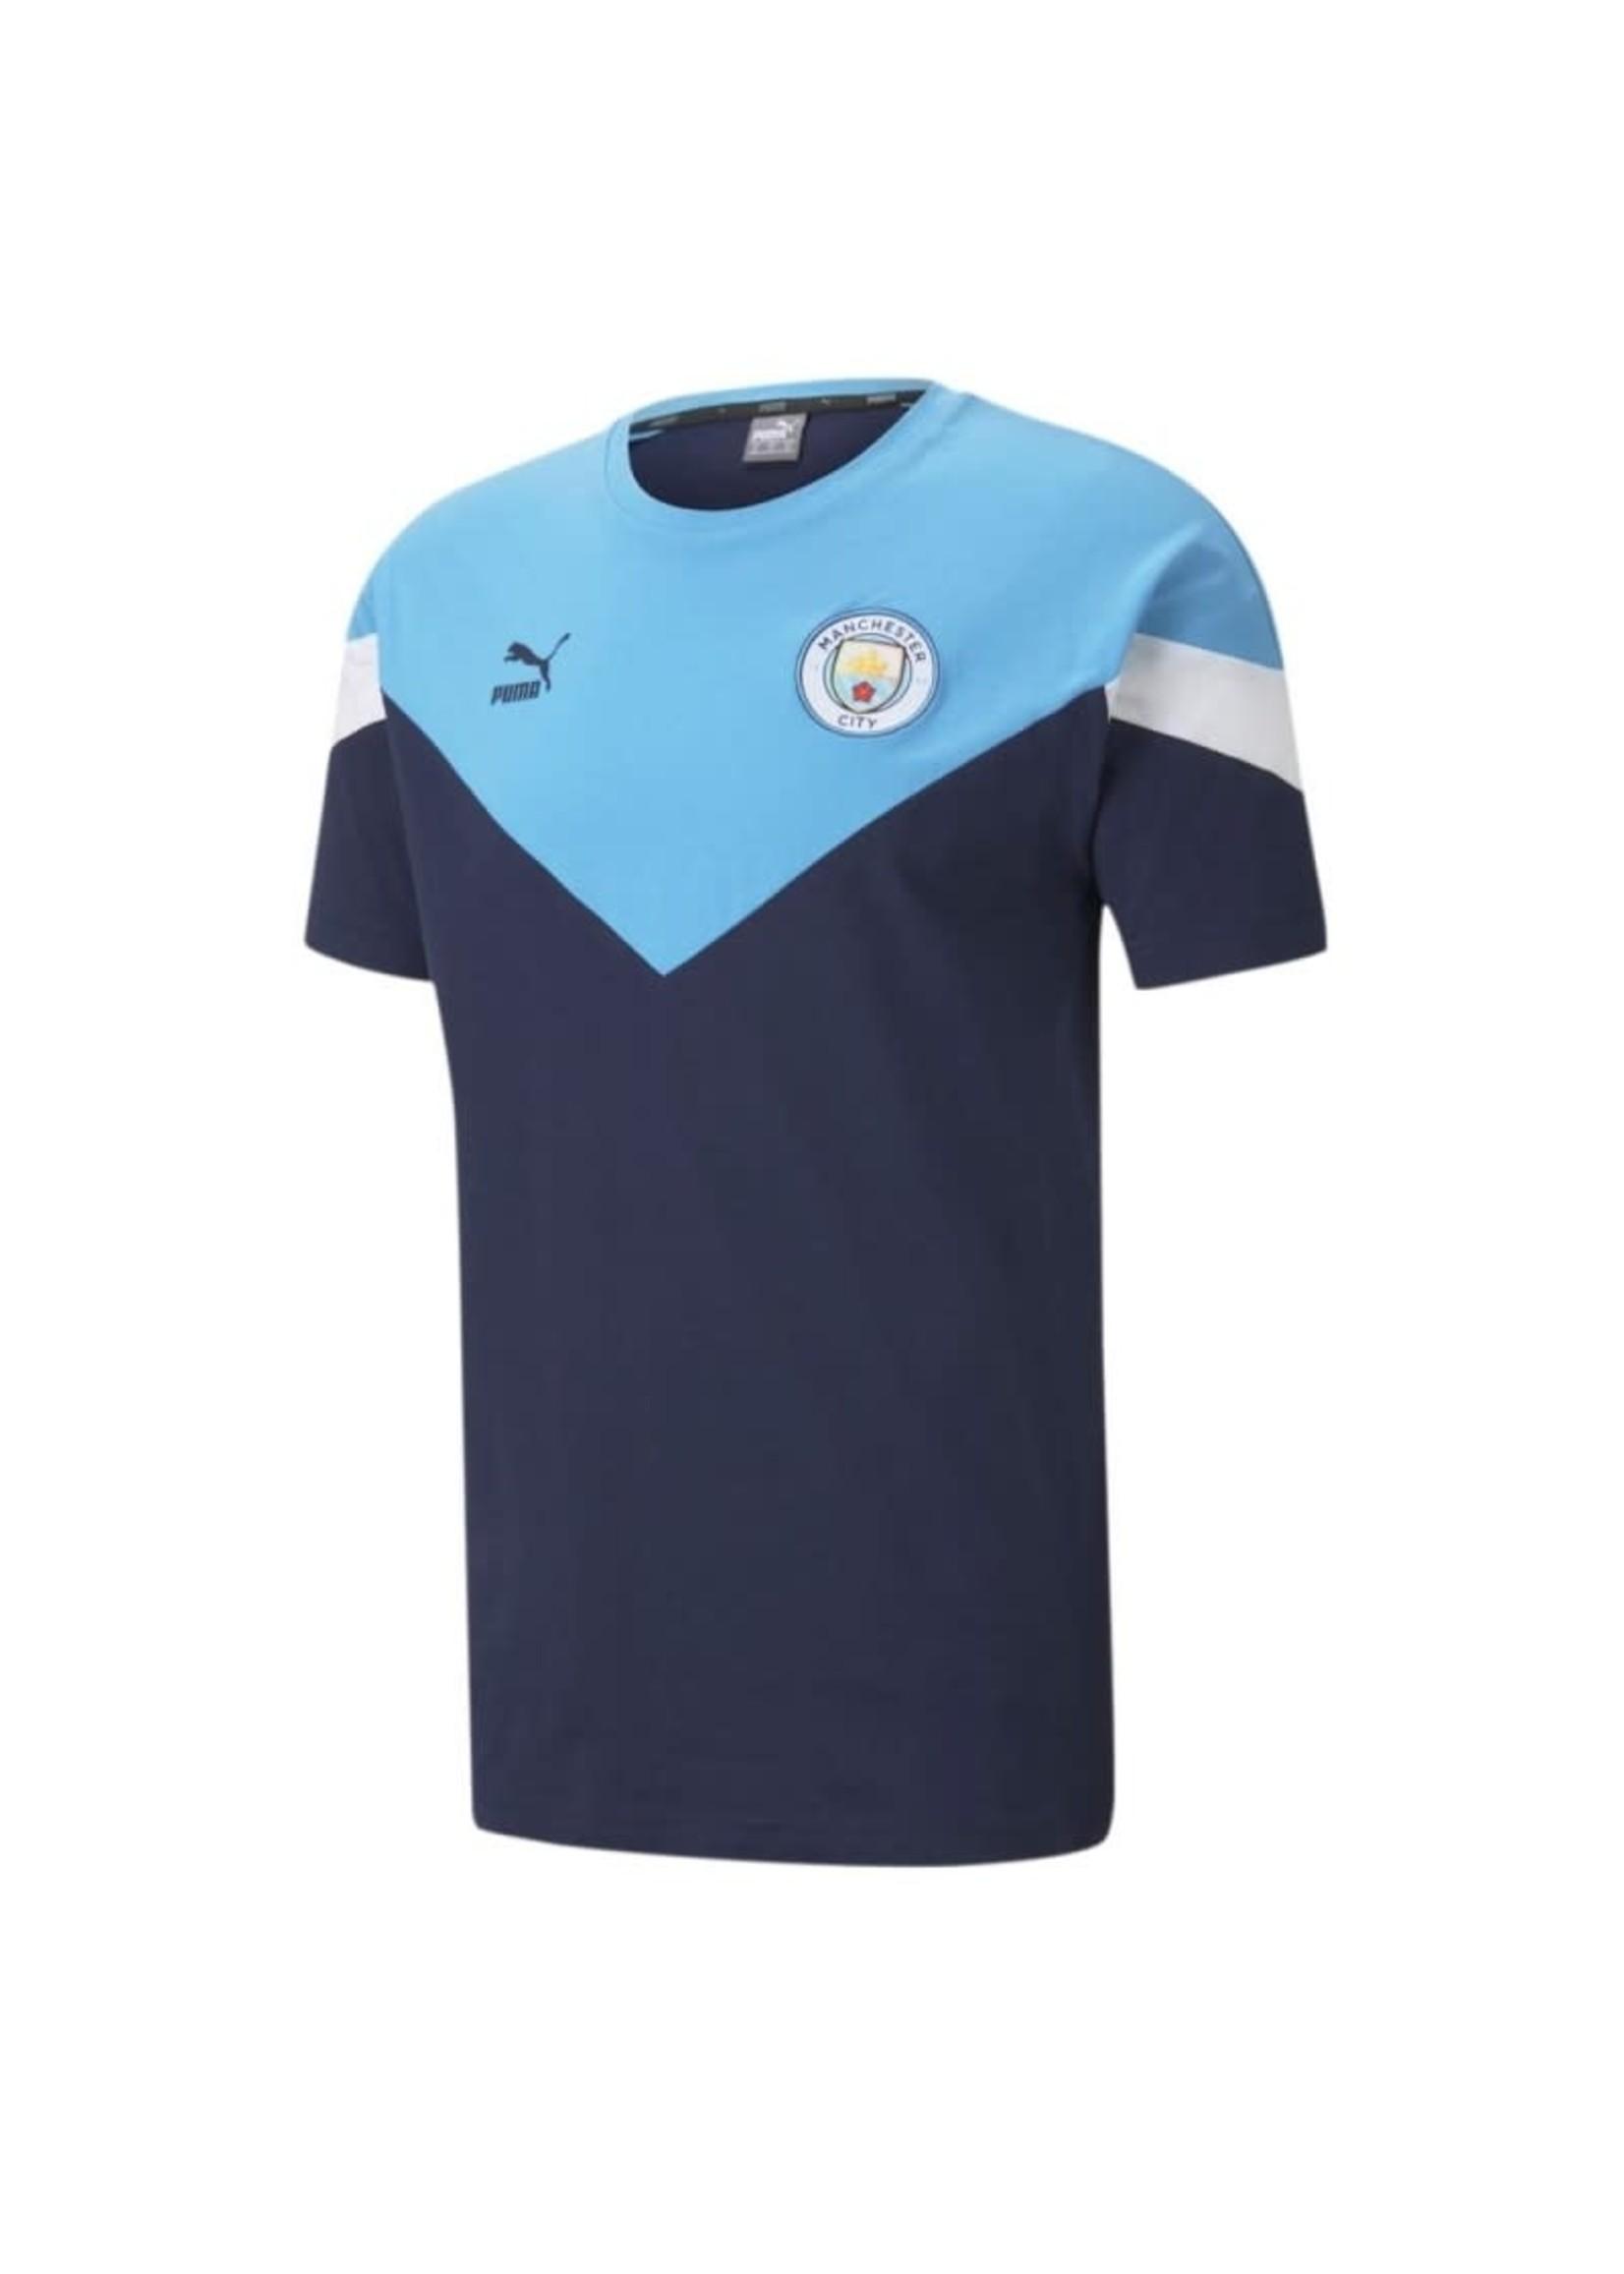 Puma Manchester City Icon T-Shirt - 20/21 Home